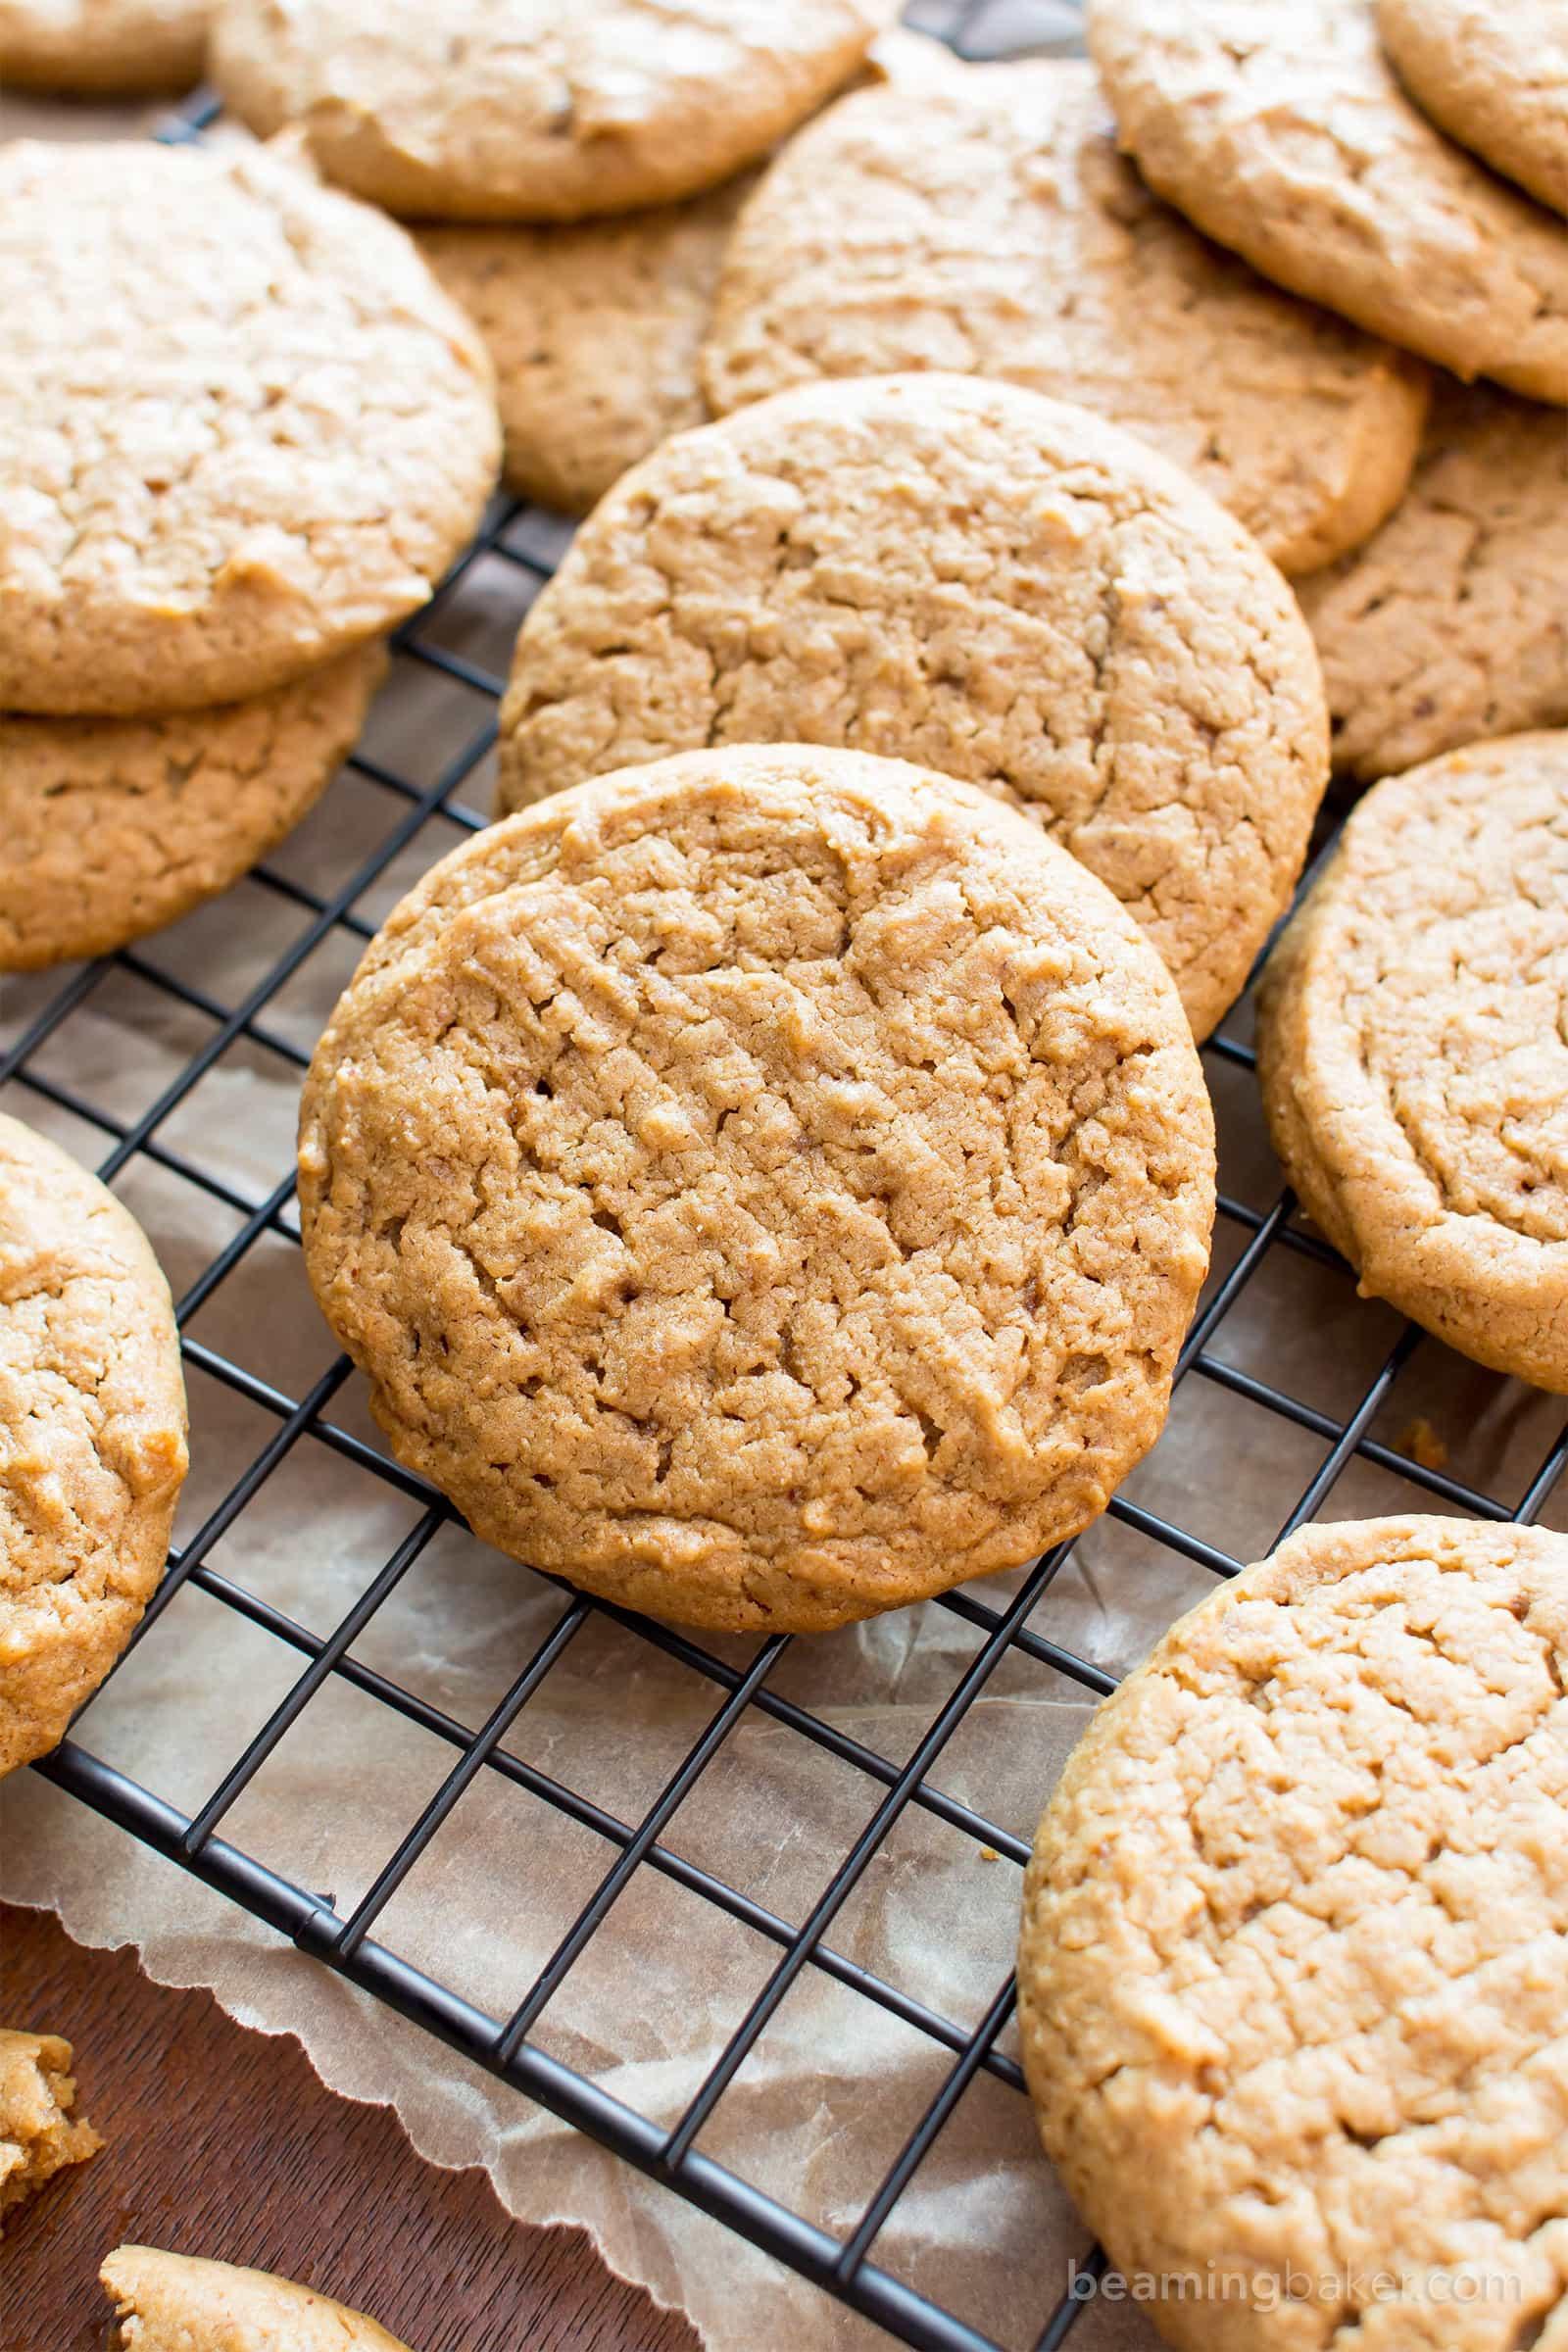 Peanut Butter Cookies Recipe Easy  easy gluten free peanut butter cookies